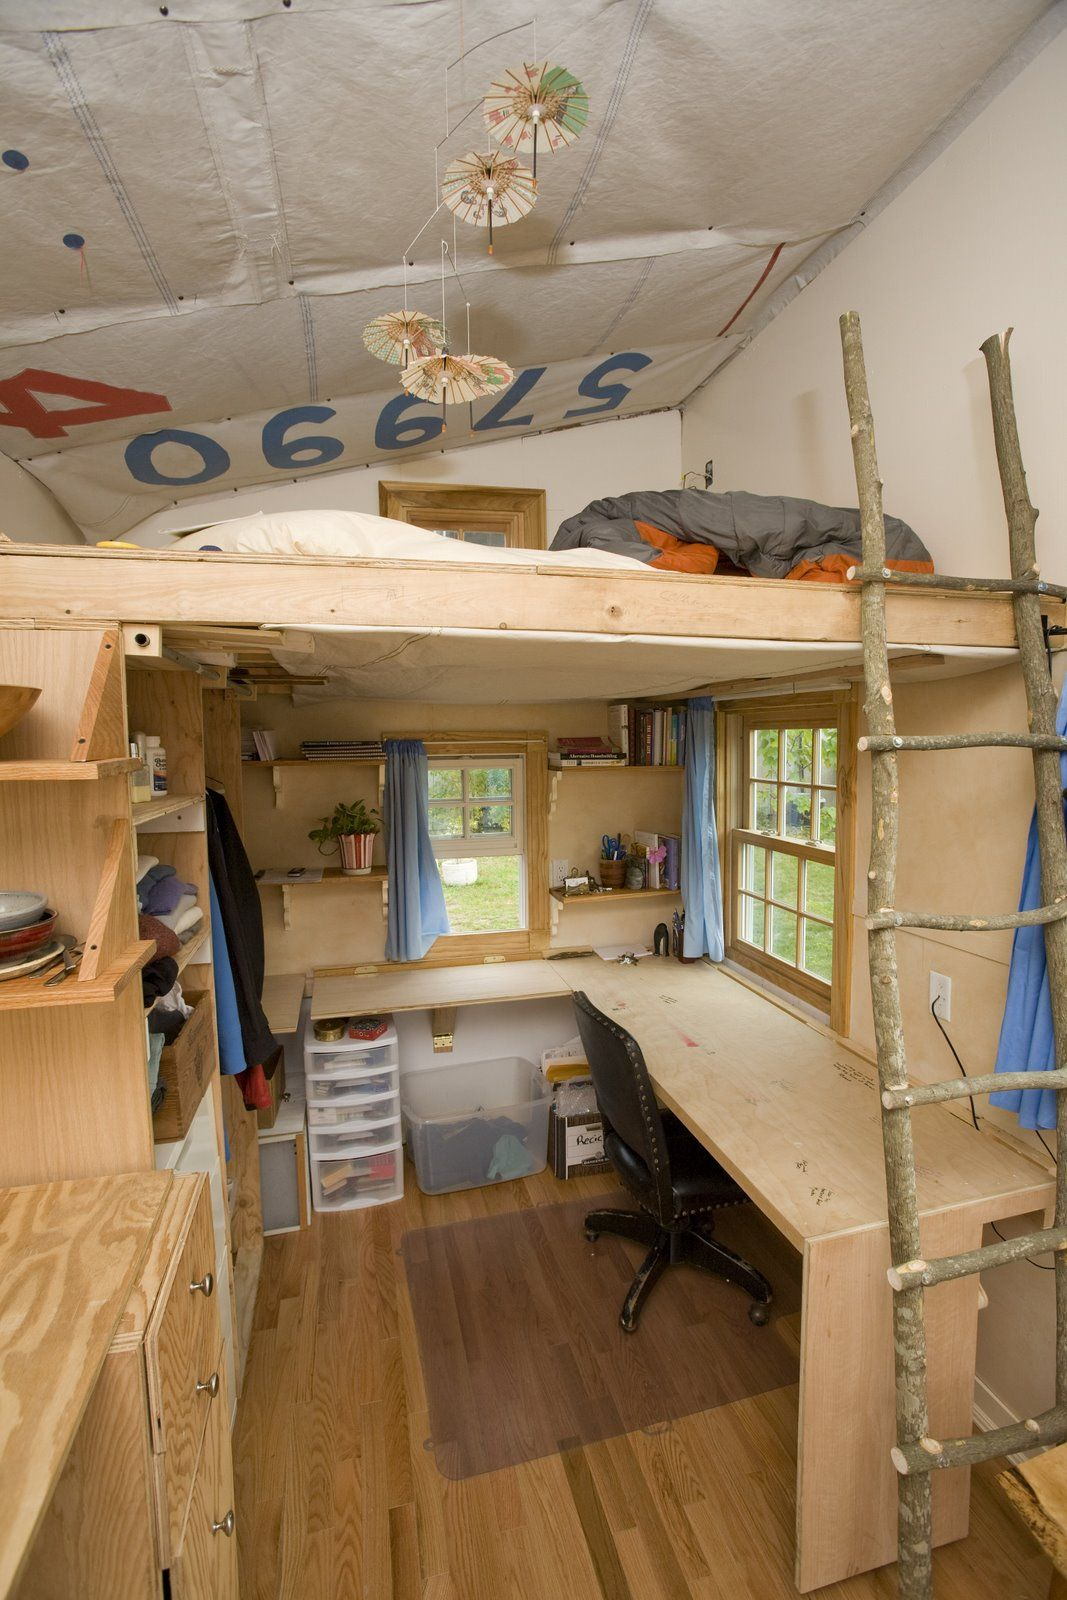 Tiny House Designs Ideas Find Inside Best Tiny House Interior Design Decorating Ideas P Tiny House Interior Design Tiny House Plans Tiny House Floor Plans